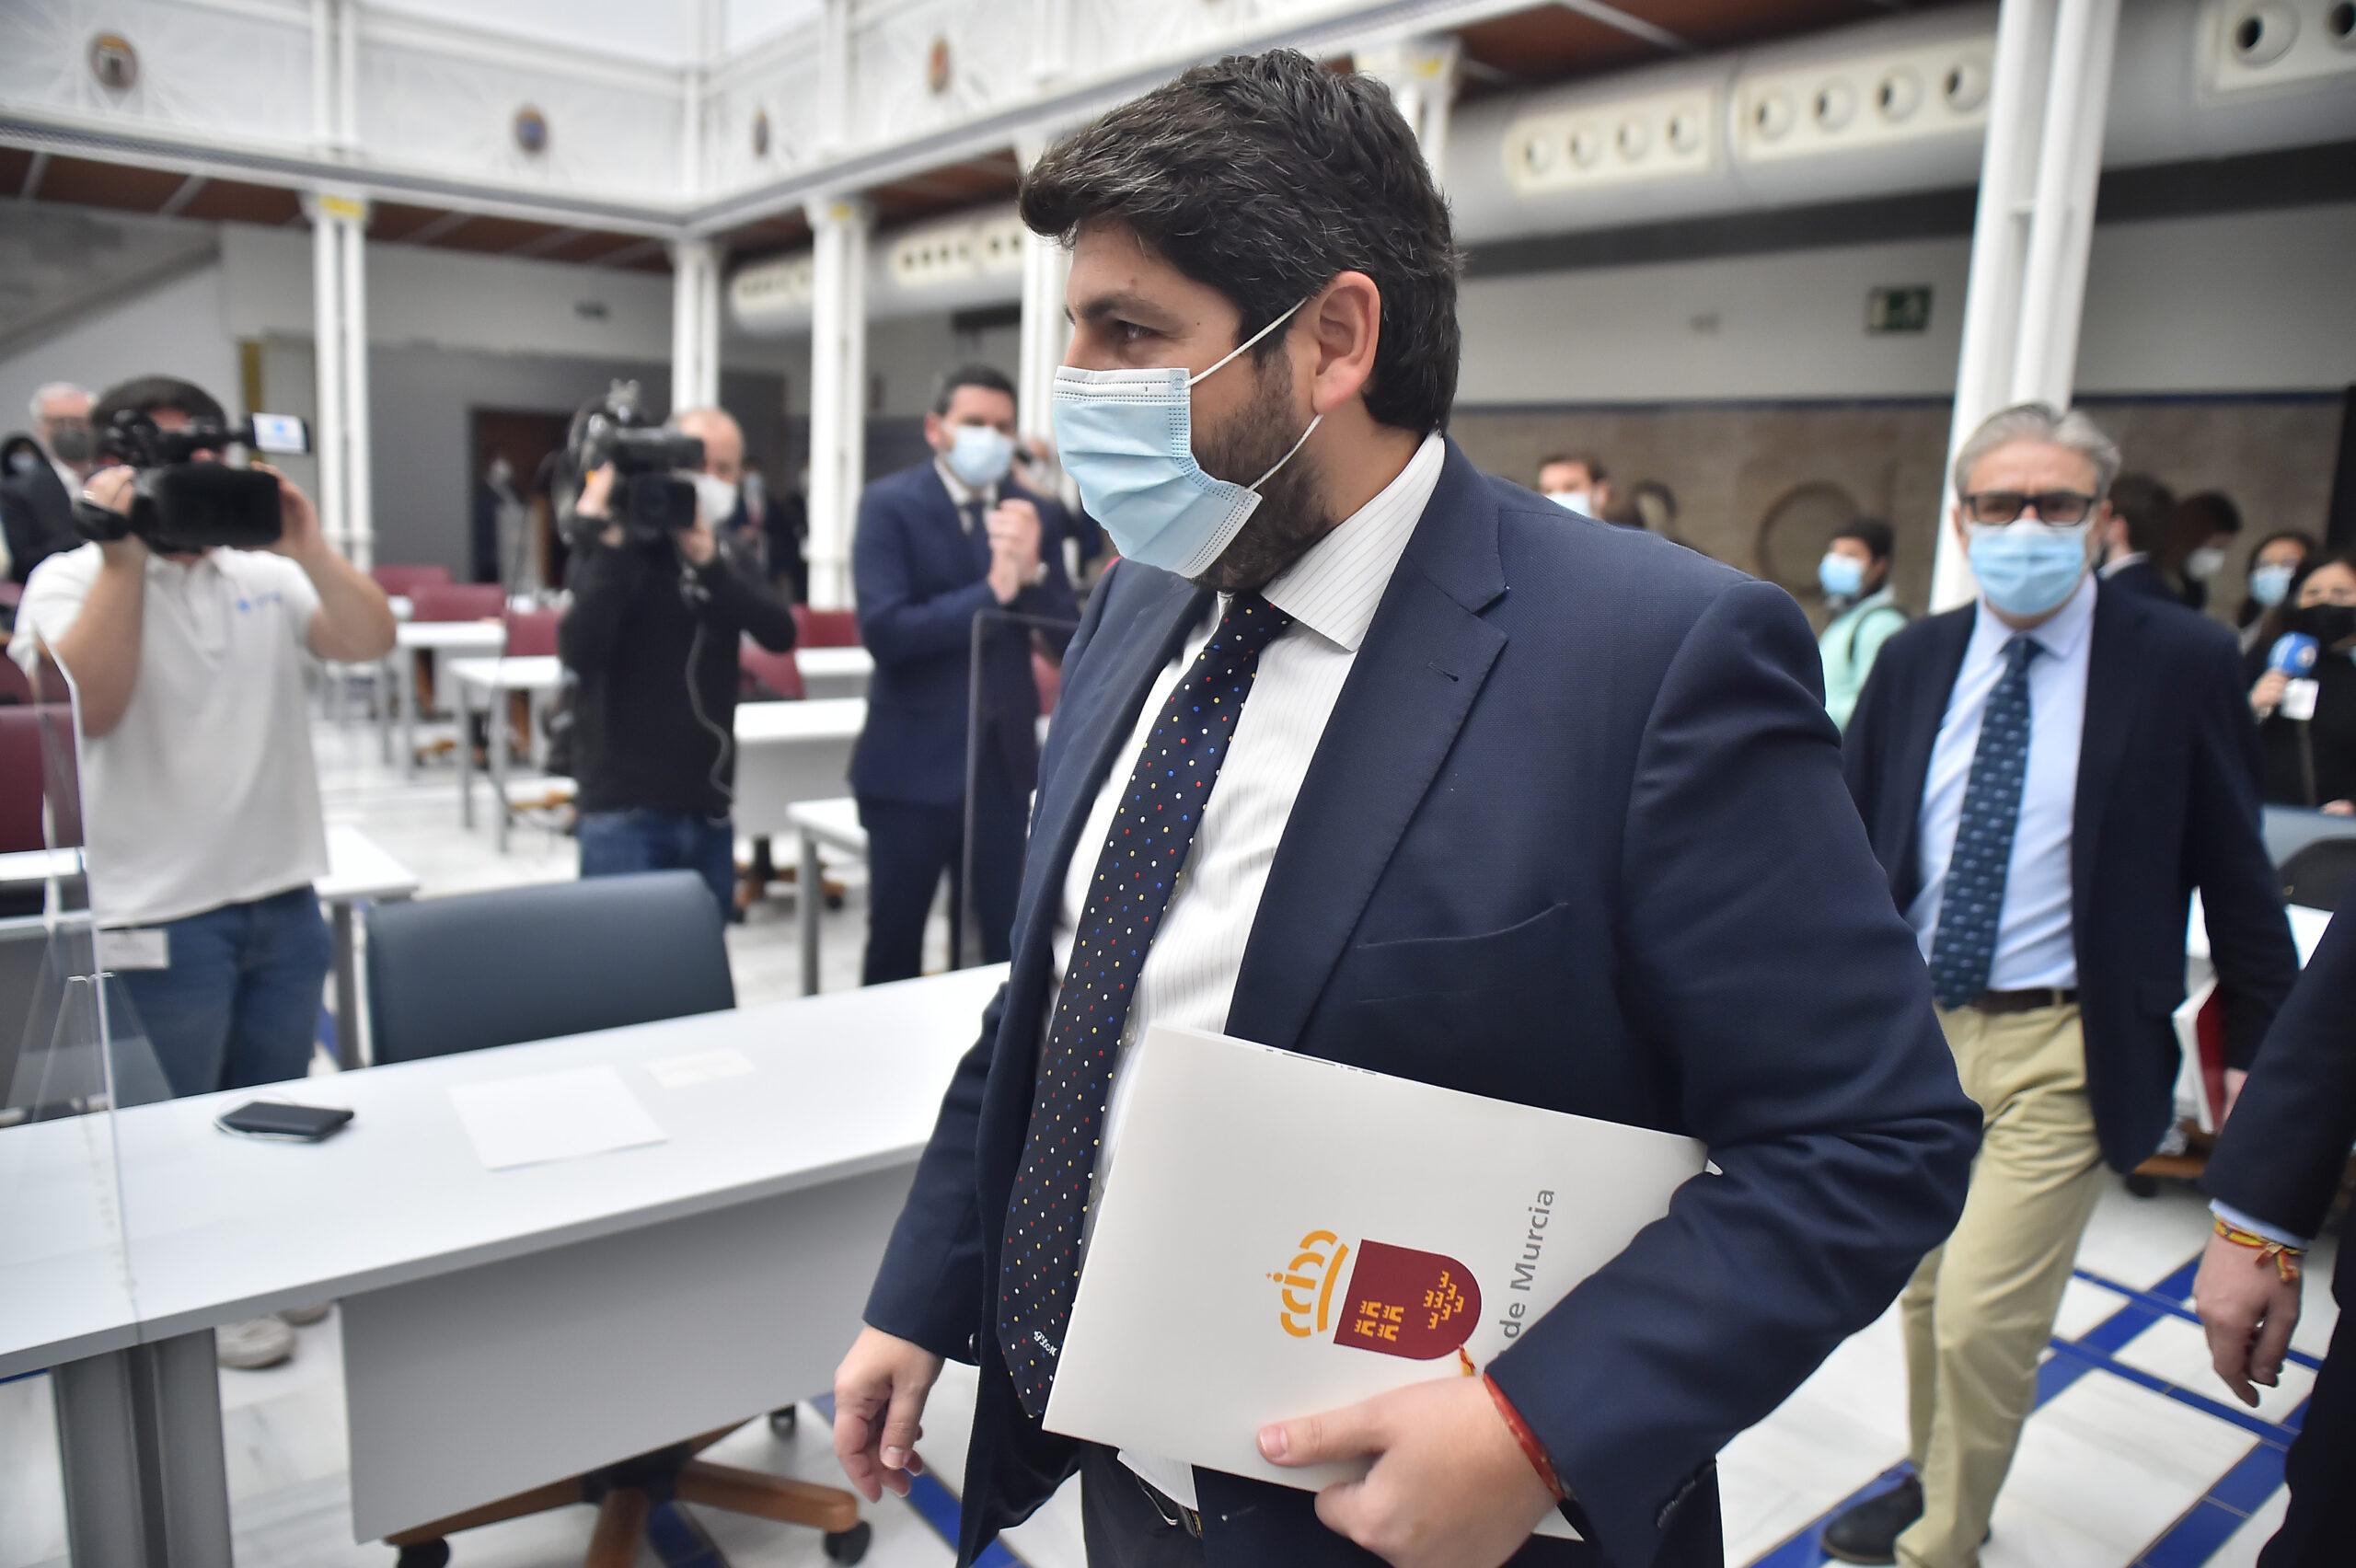 El president de Múrcia, Fernando López Miras, arribant al ple de la moció de censura | Europa Press